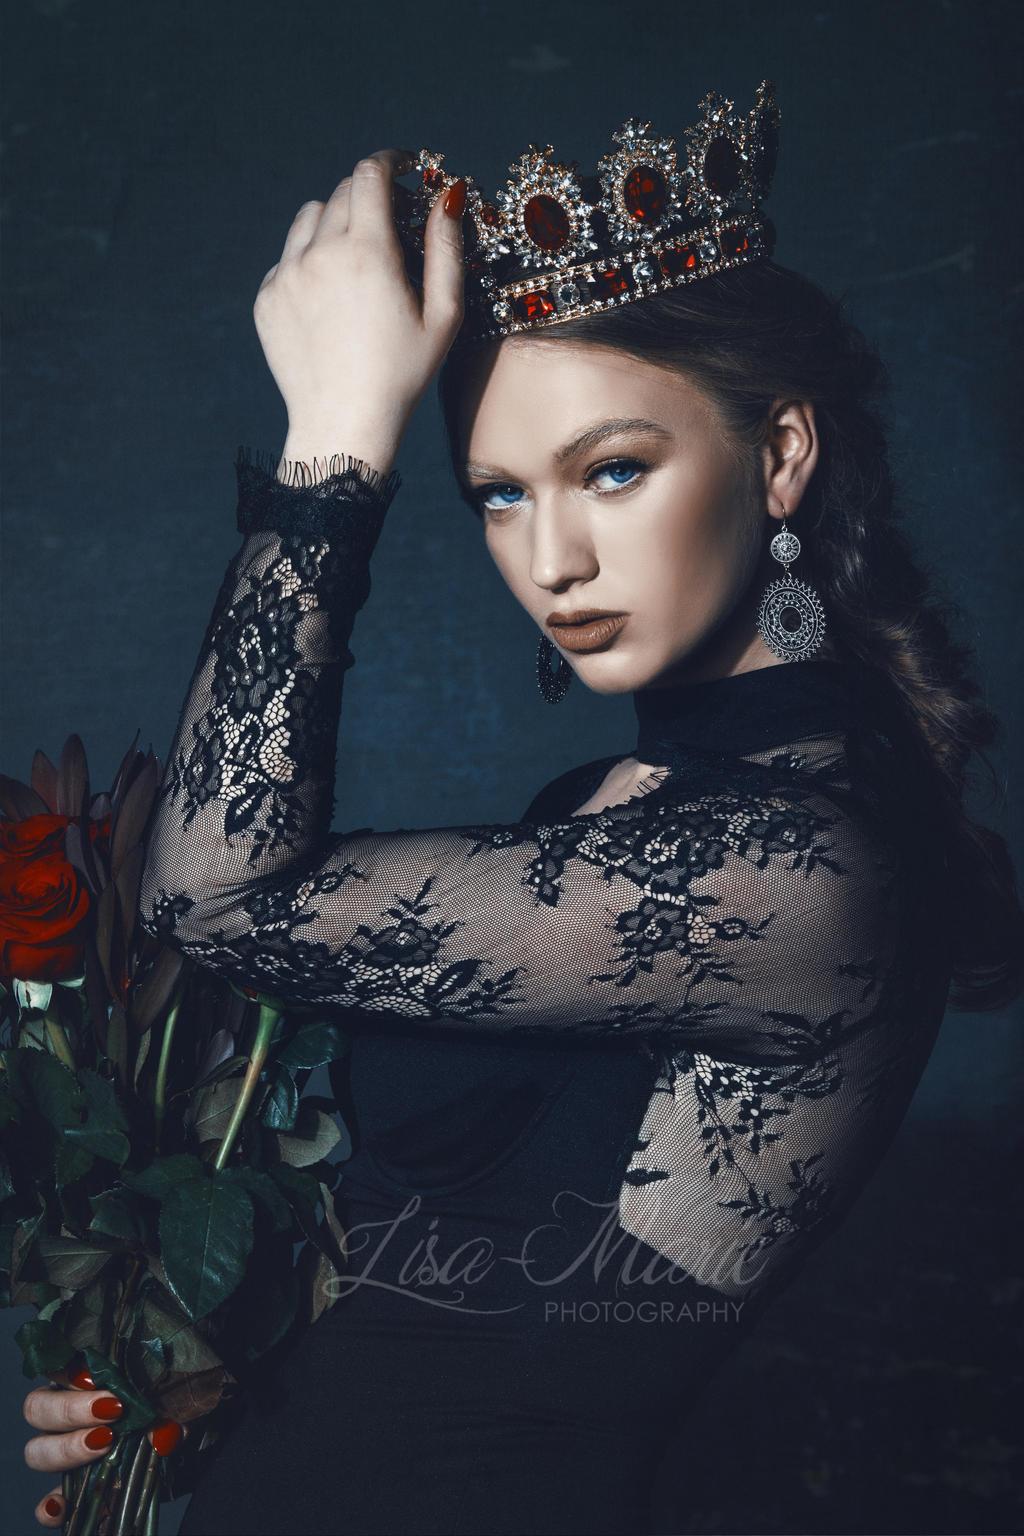 Royalty by Lisa-MariePhotog